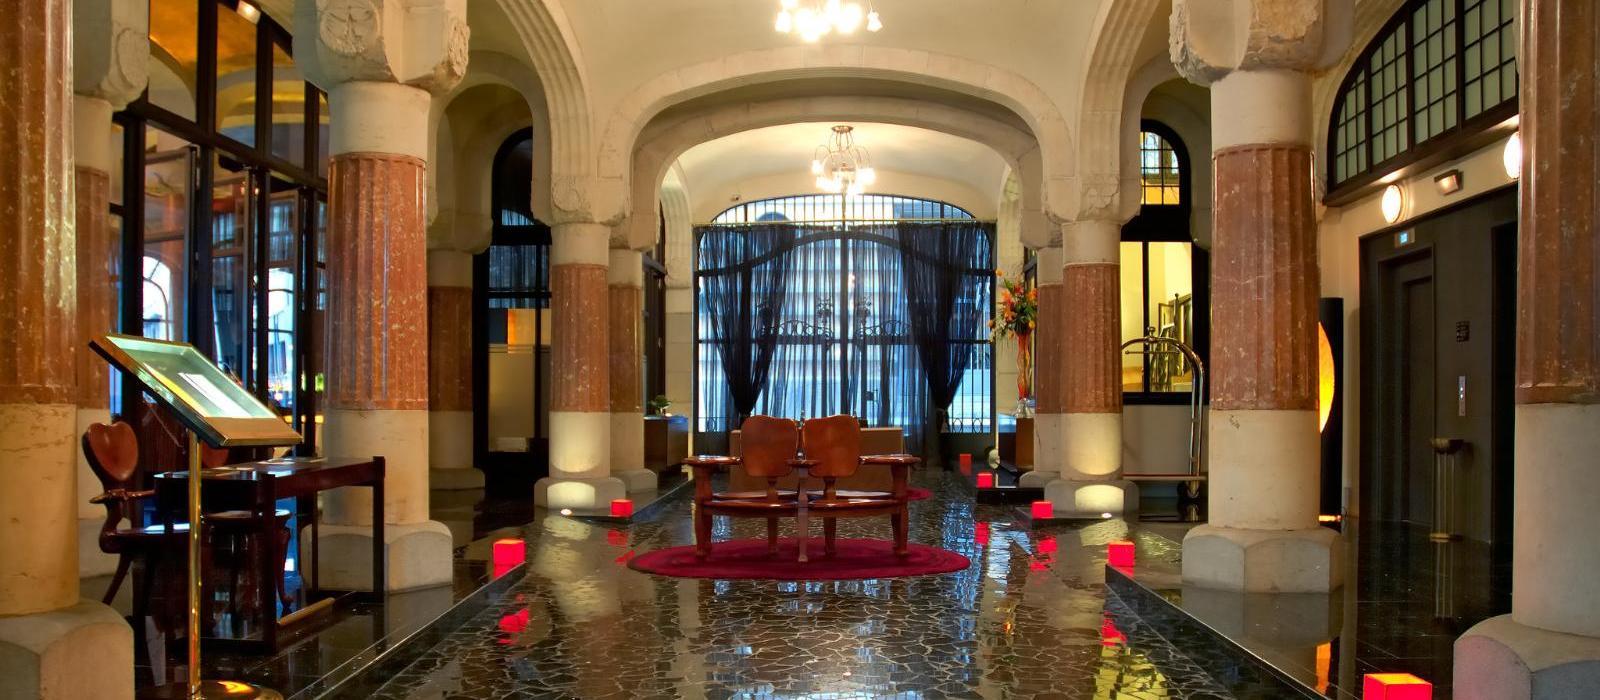 富诗之家酒店(Hotel Casa Fuster) 大堂图片  www.lhw.cn